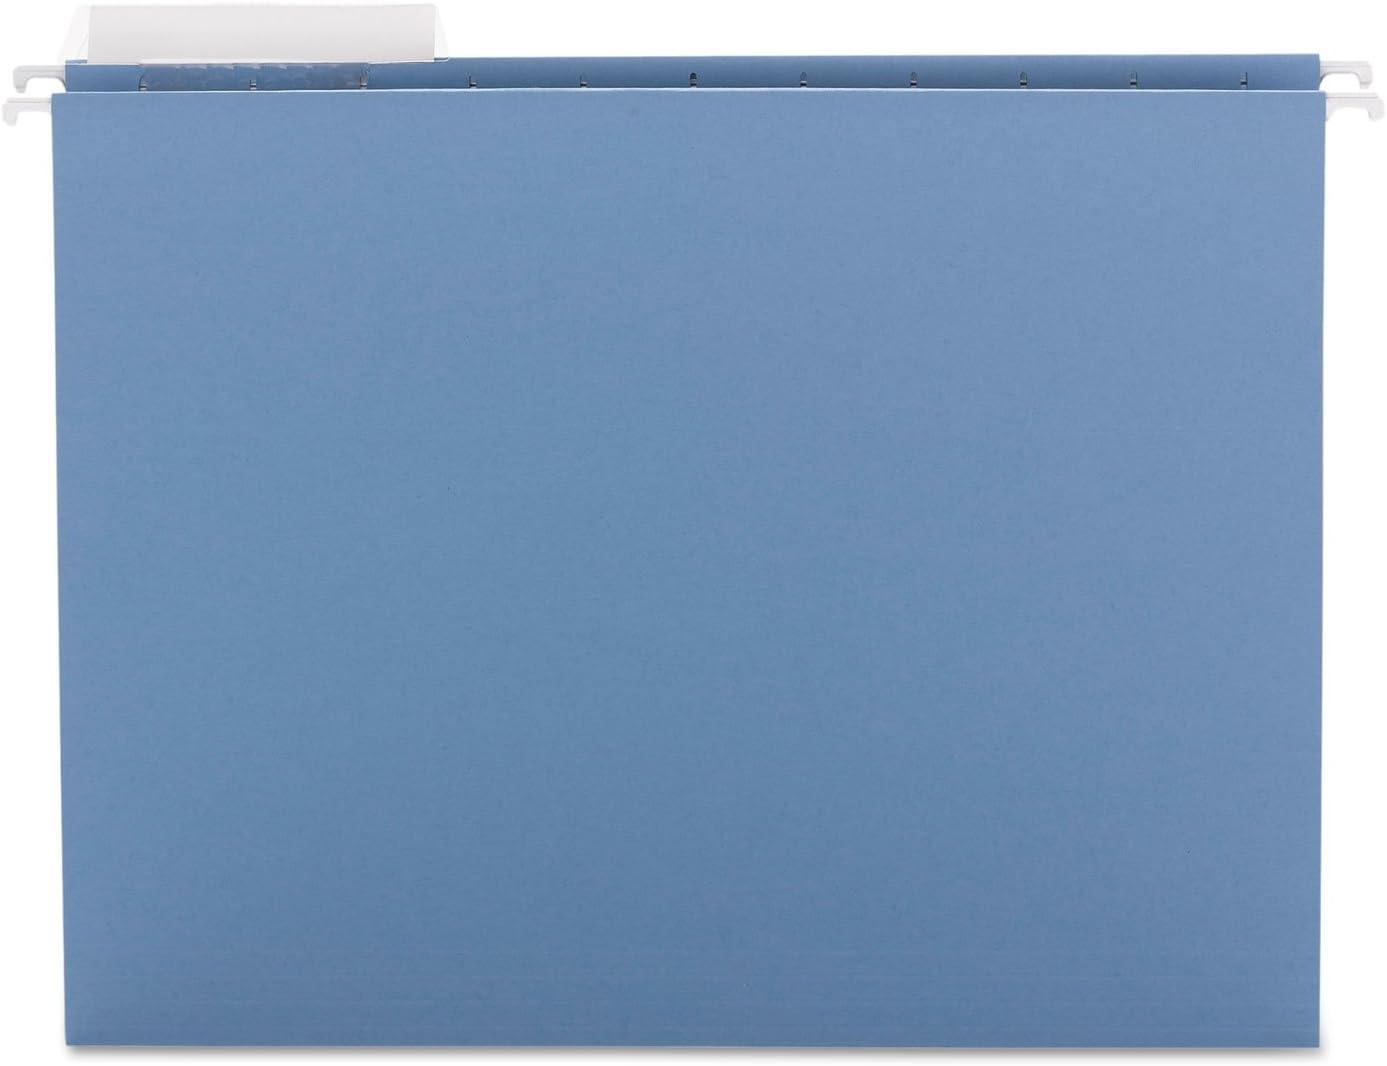 Folder Hanging Max 57% OFF LTR Blue 3 Challenge the lowest price 1